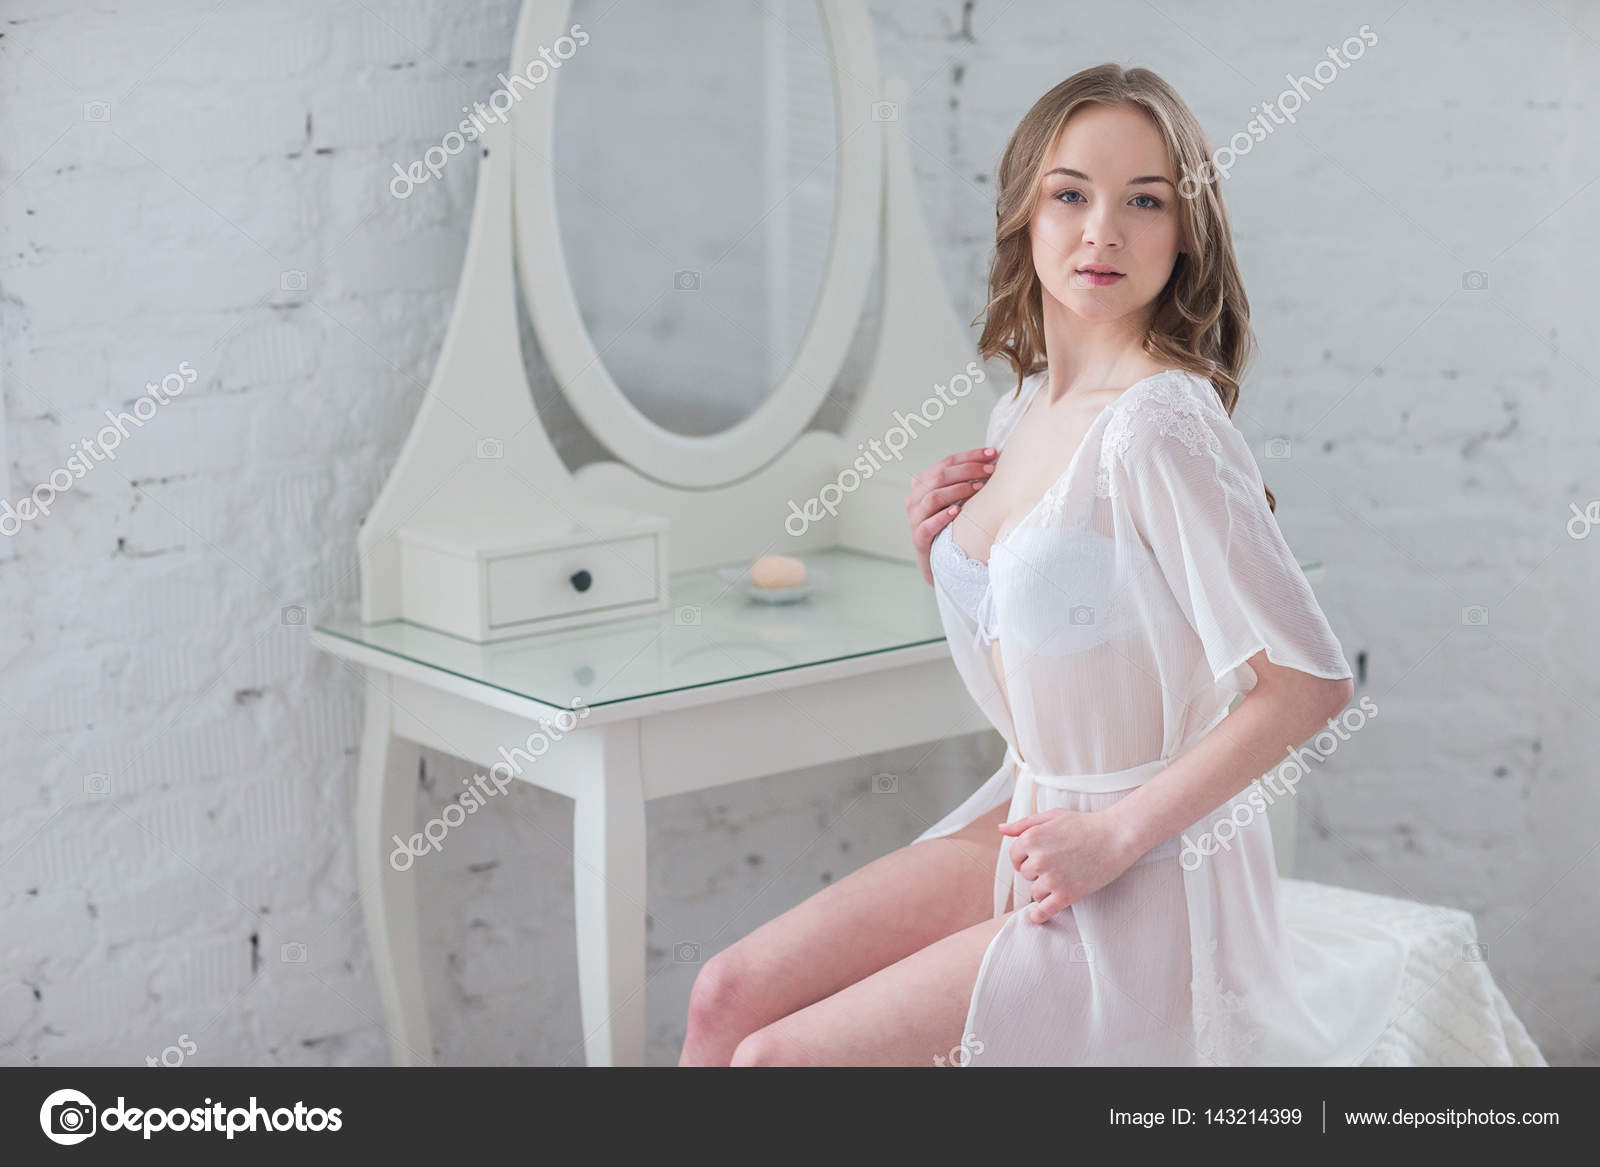 erotic-bride-pictures-nitro-tech-hardcore